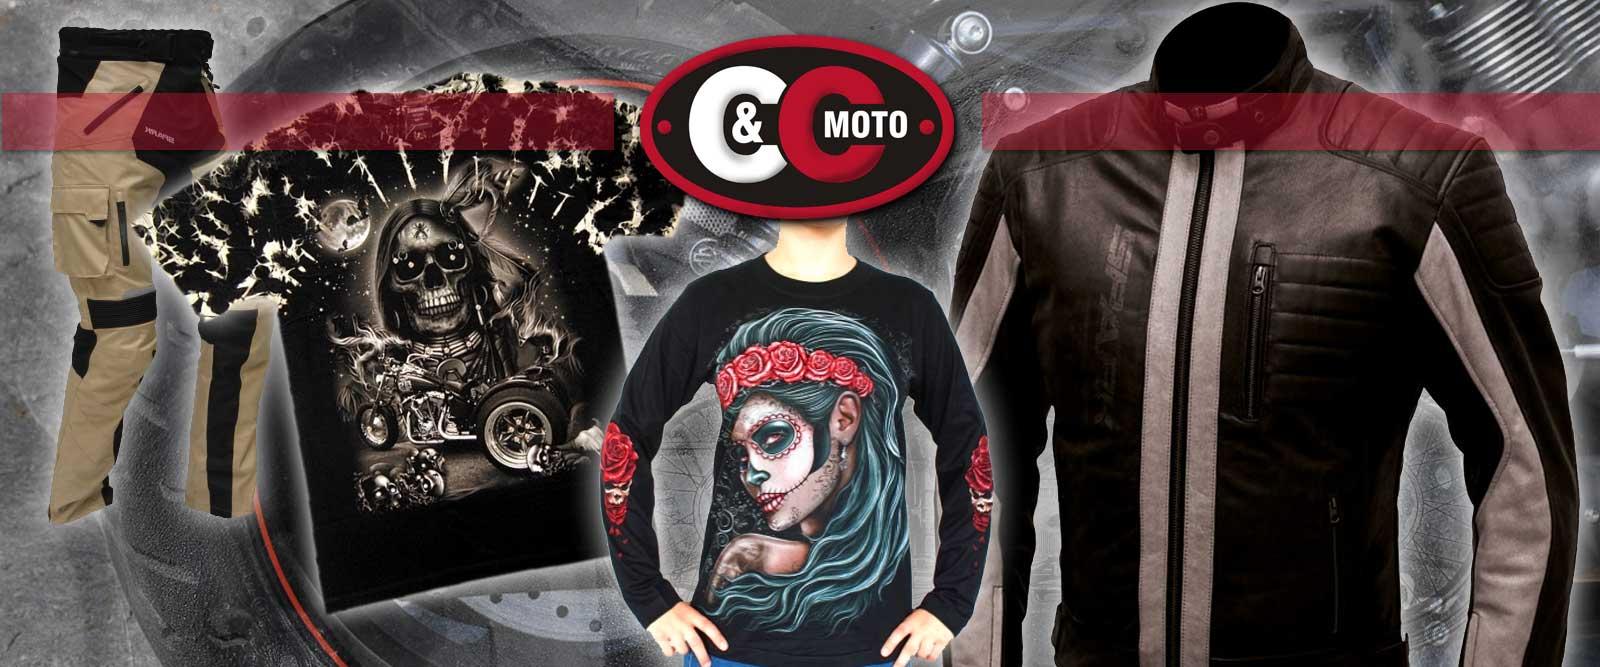 C C MOTO prodej a bazar s motocykly 2224e76c46